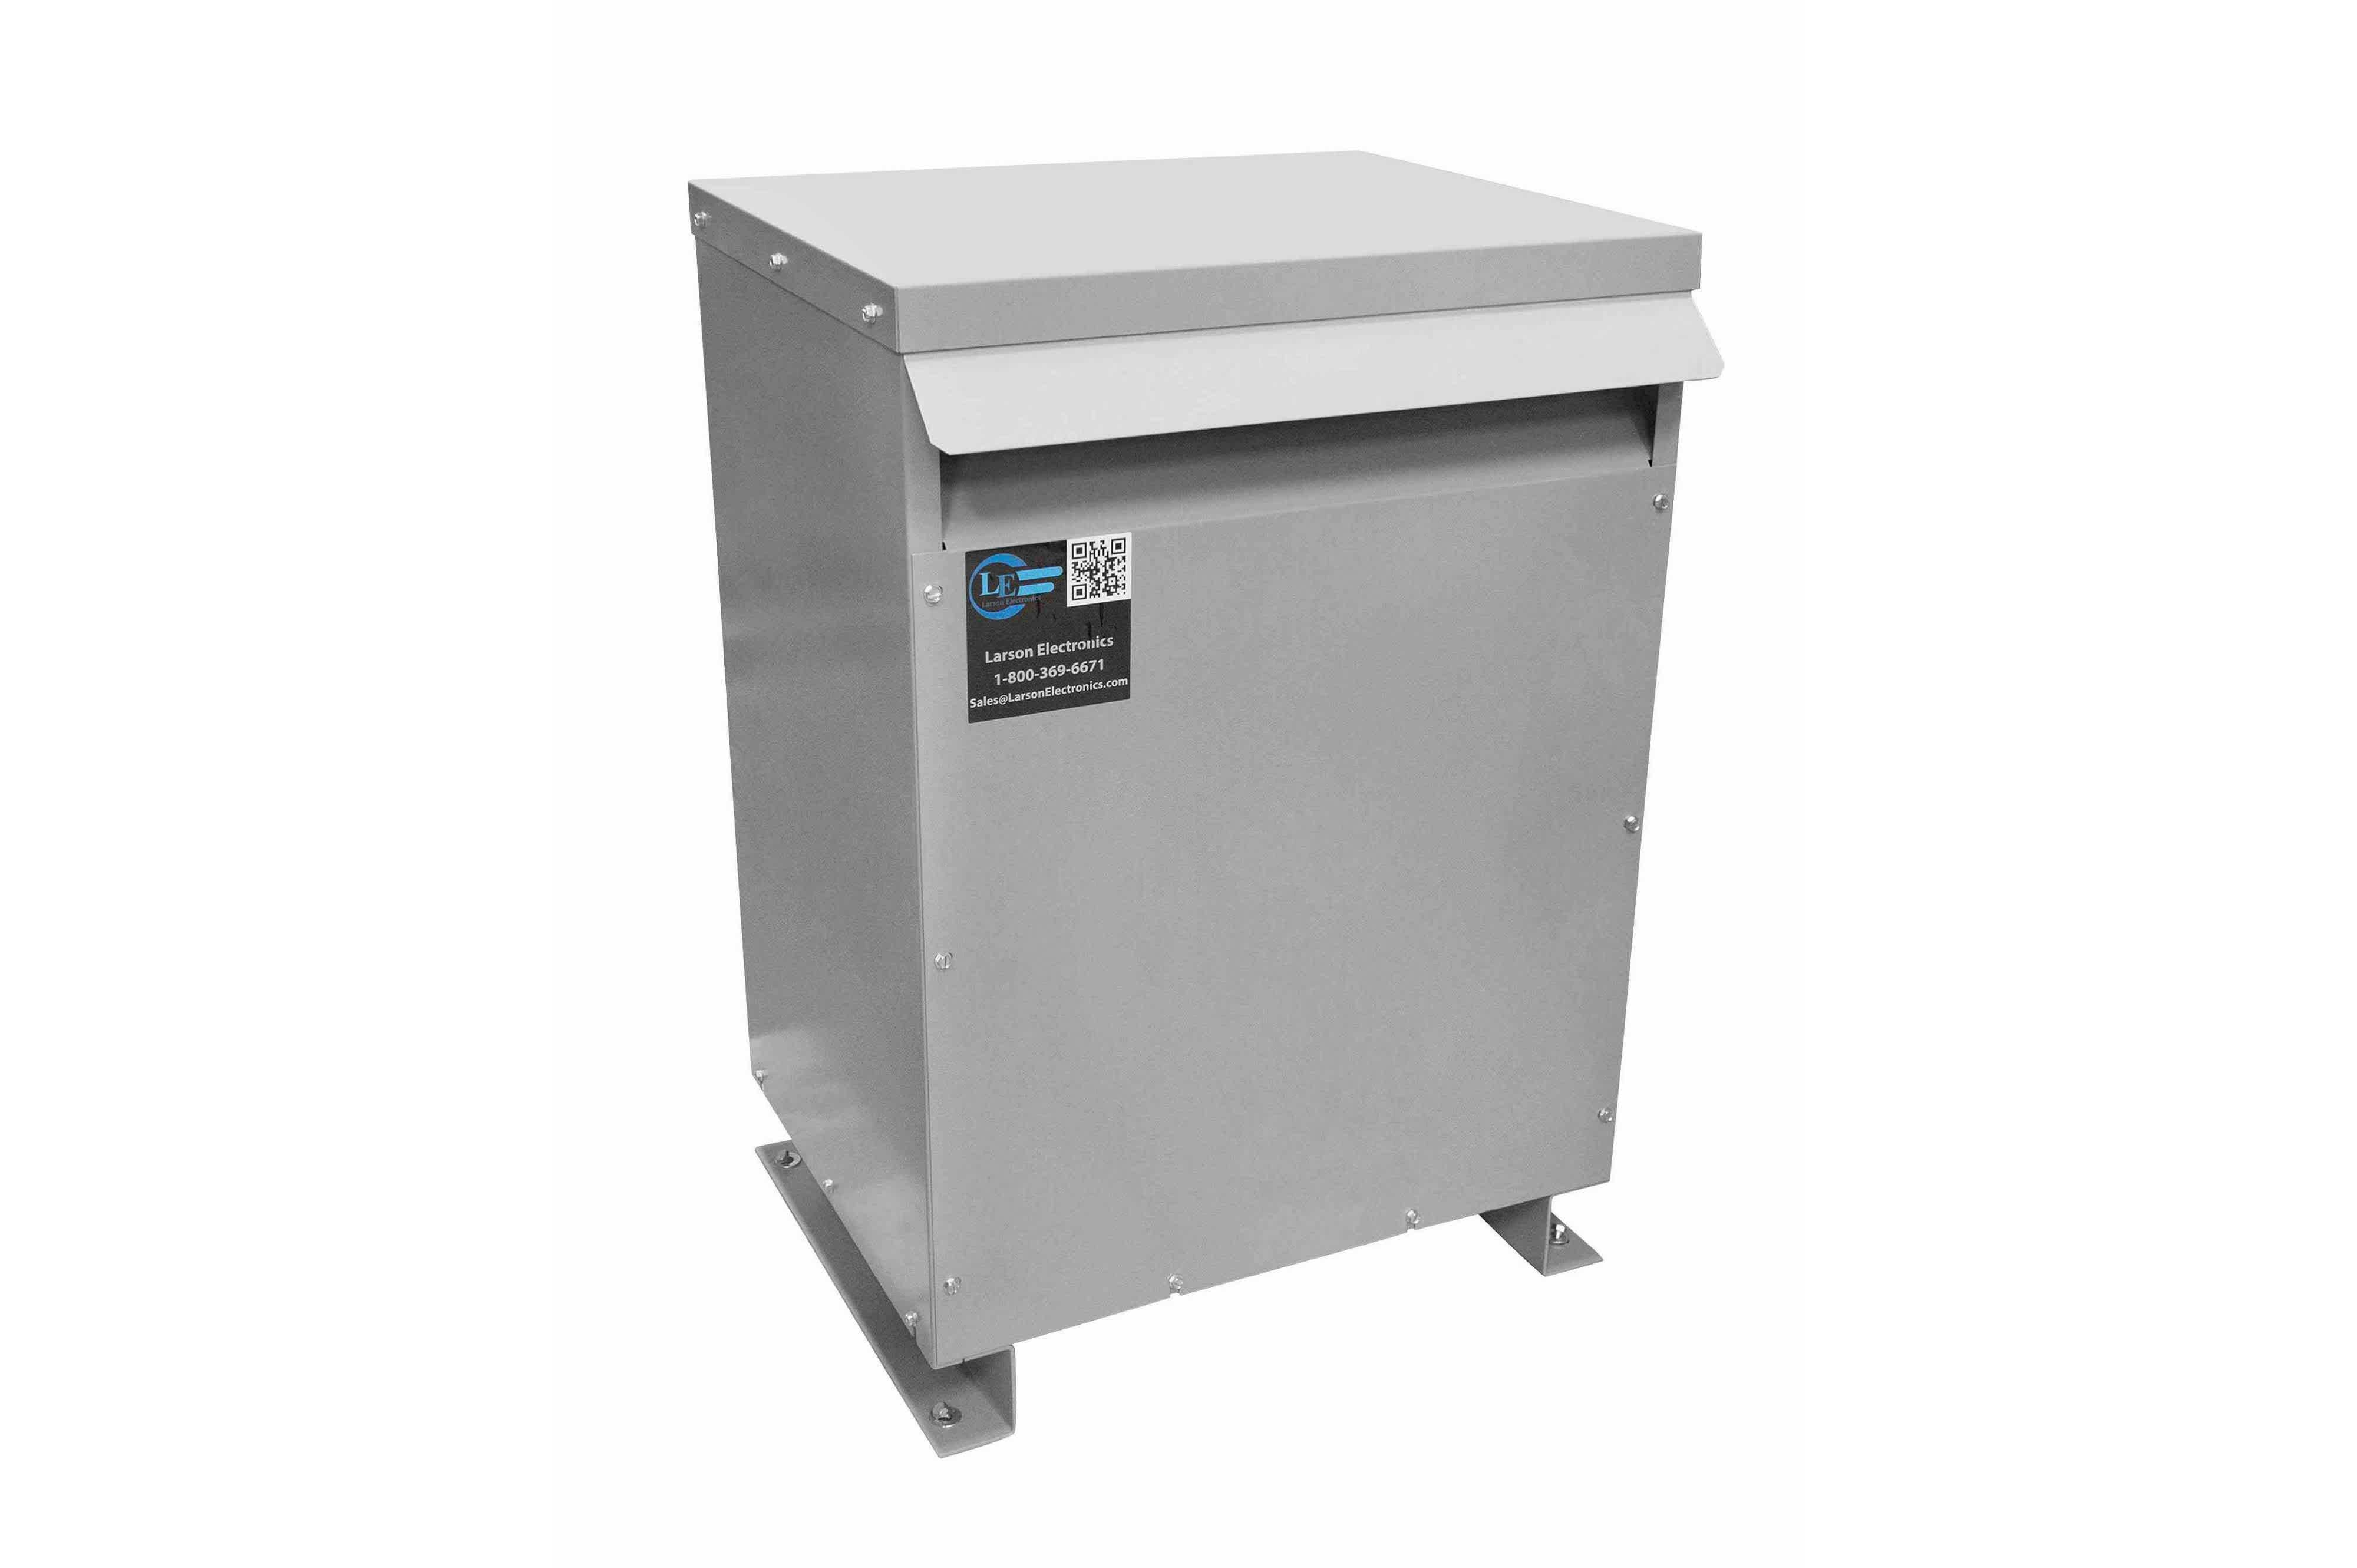 225 kVA 3PH DOE Transformer, 480V Delta Primary, 600Y/347 Wye-N Secondary, N3R, Ventilated, 60 Hz